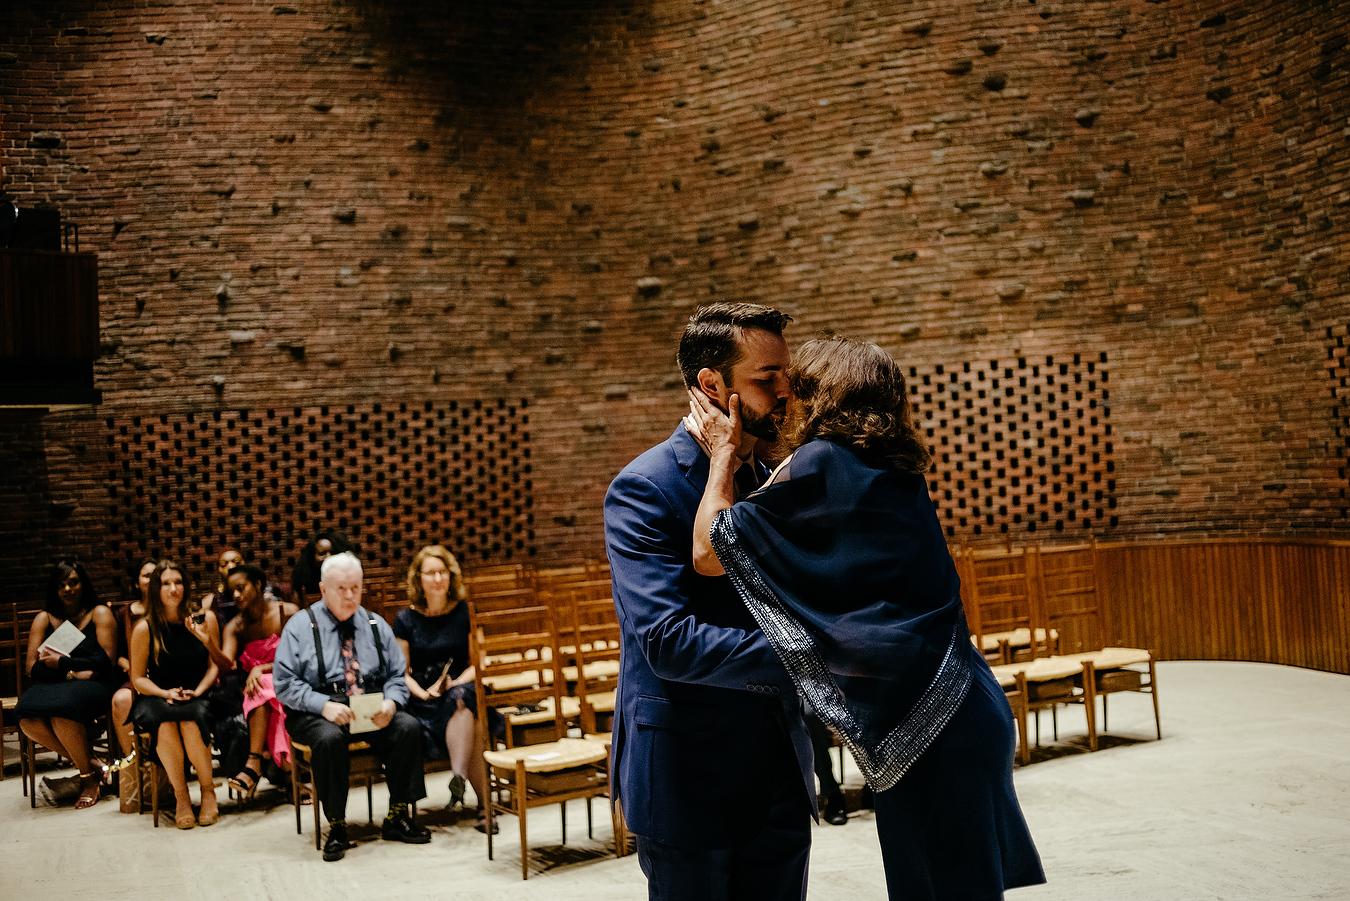 mit_chapel_cambridge_wedding_photos_40.JPG